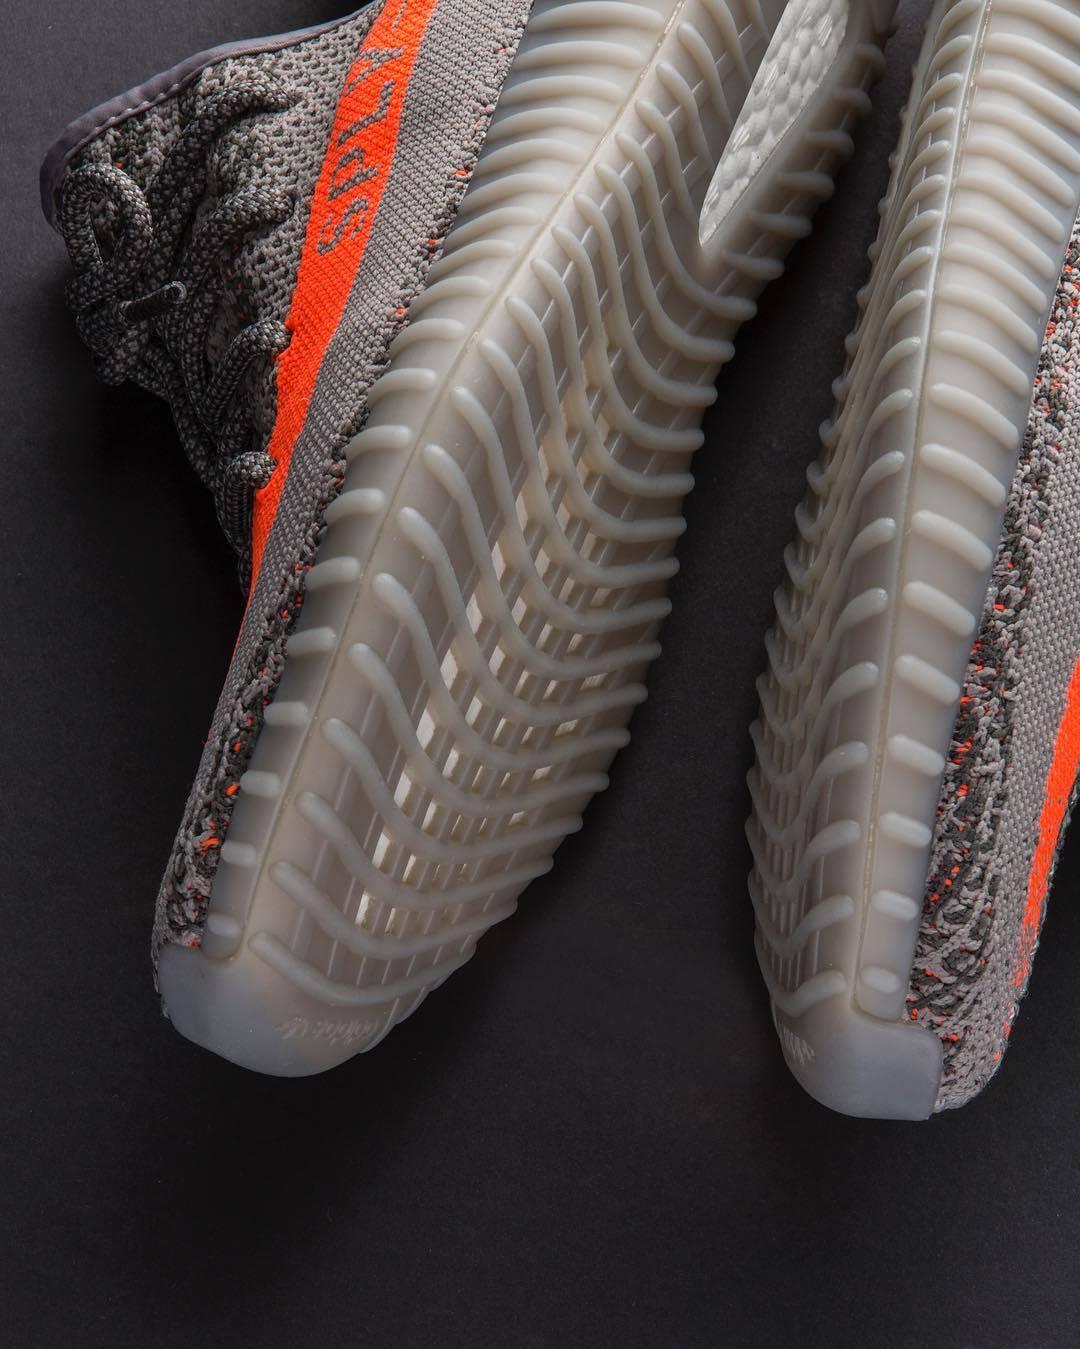 adidas-yeezy-boost-350-v2-beluga-05